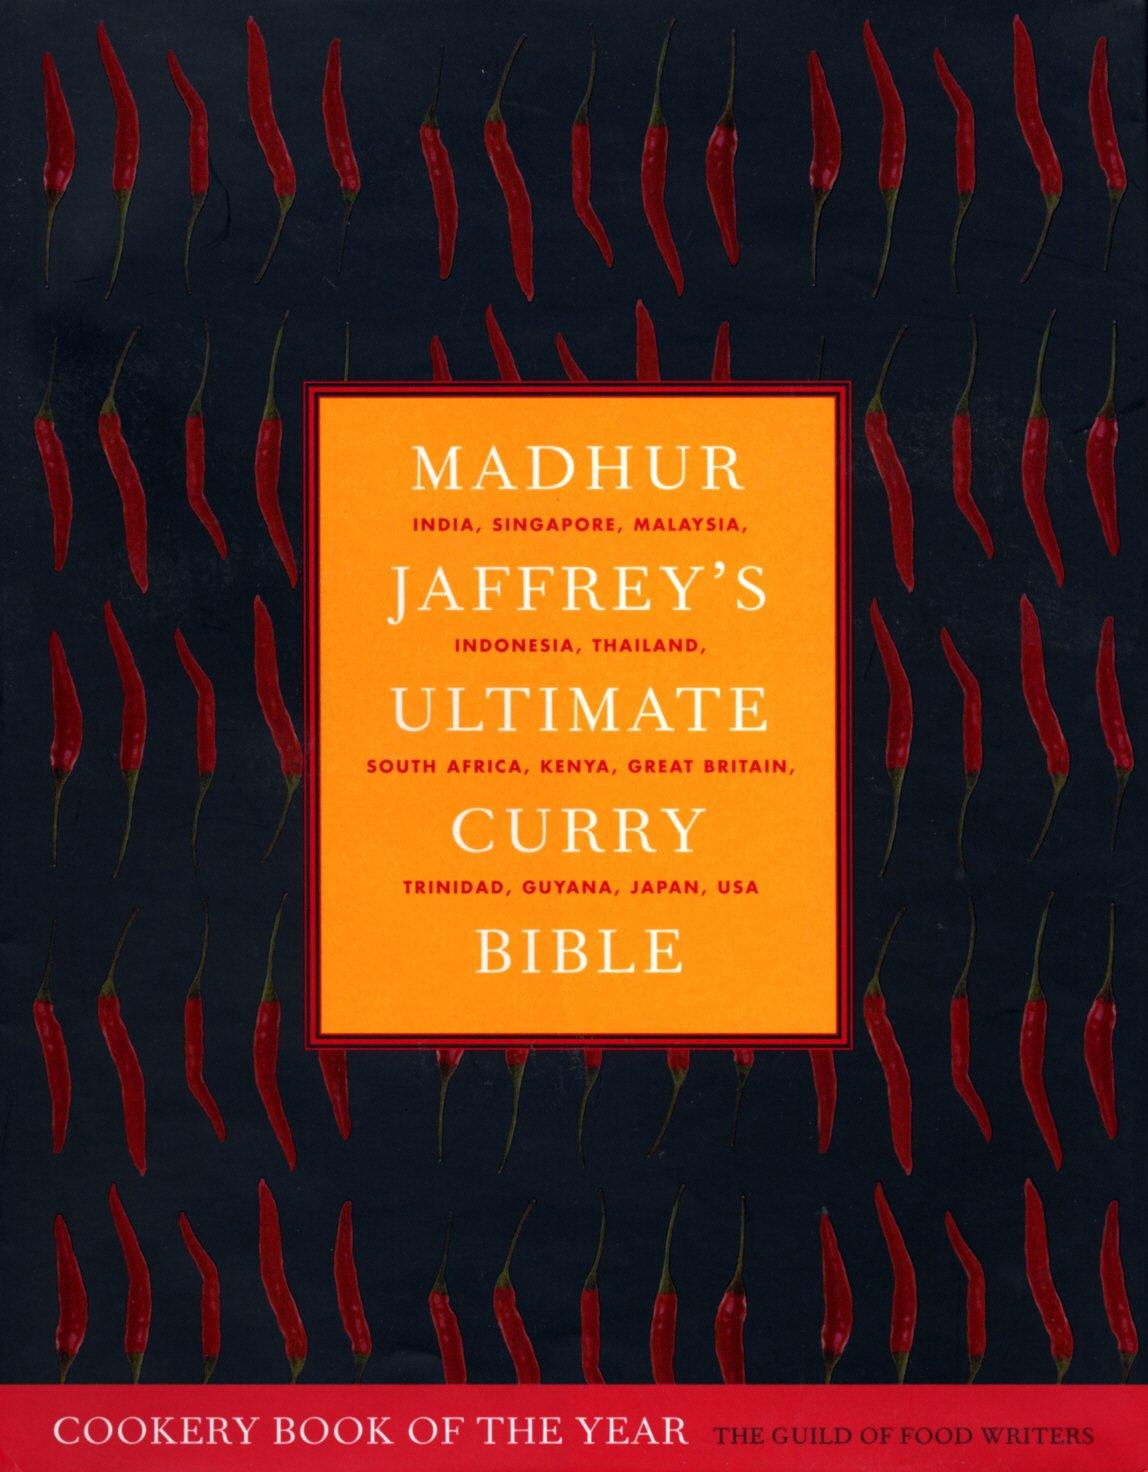 Madhur Jaffrey's Ultimate Curry Bible: India, Singapore